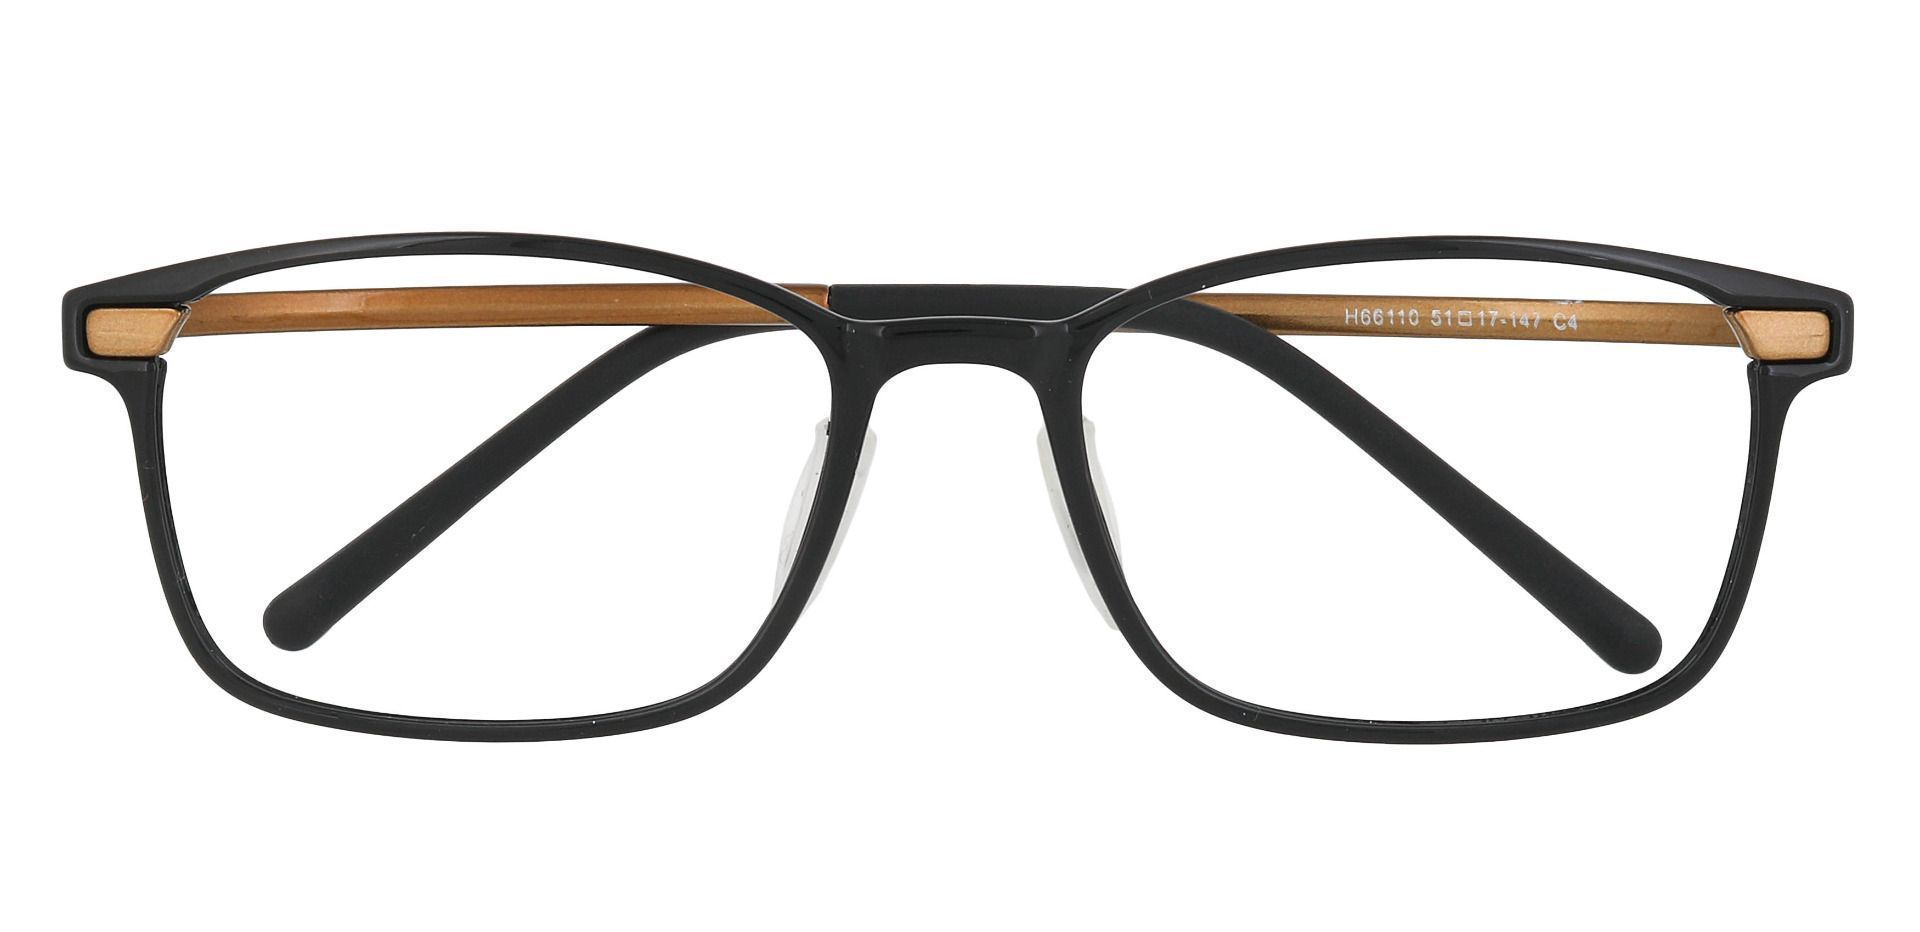 Weaver Rectangle Prescription Glasses - Gold